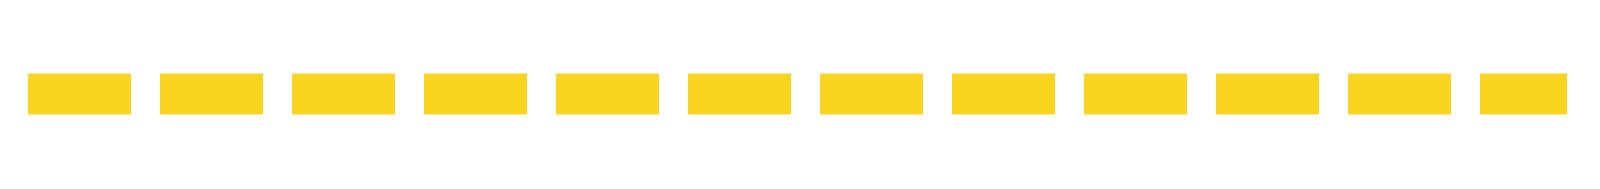 Línea amarilla continua